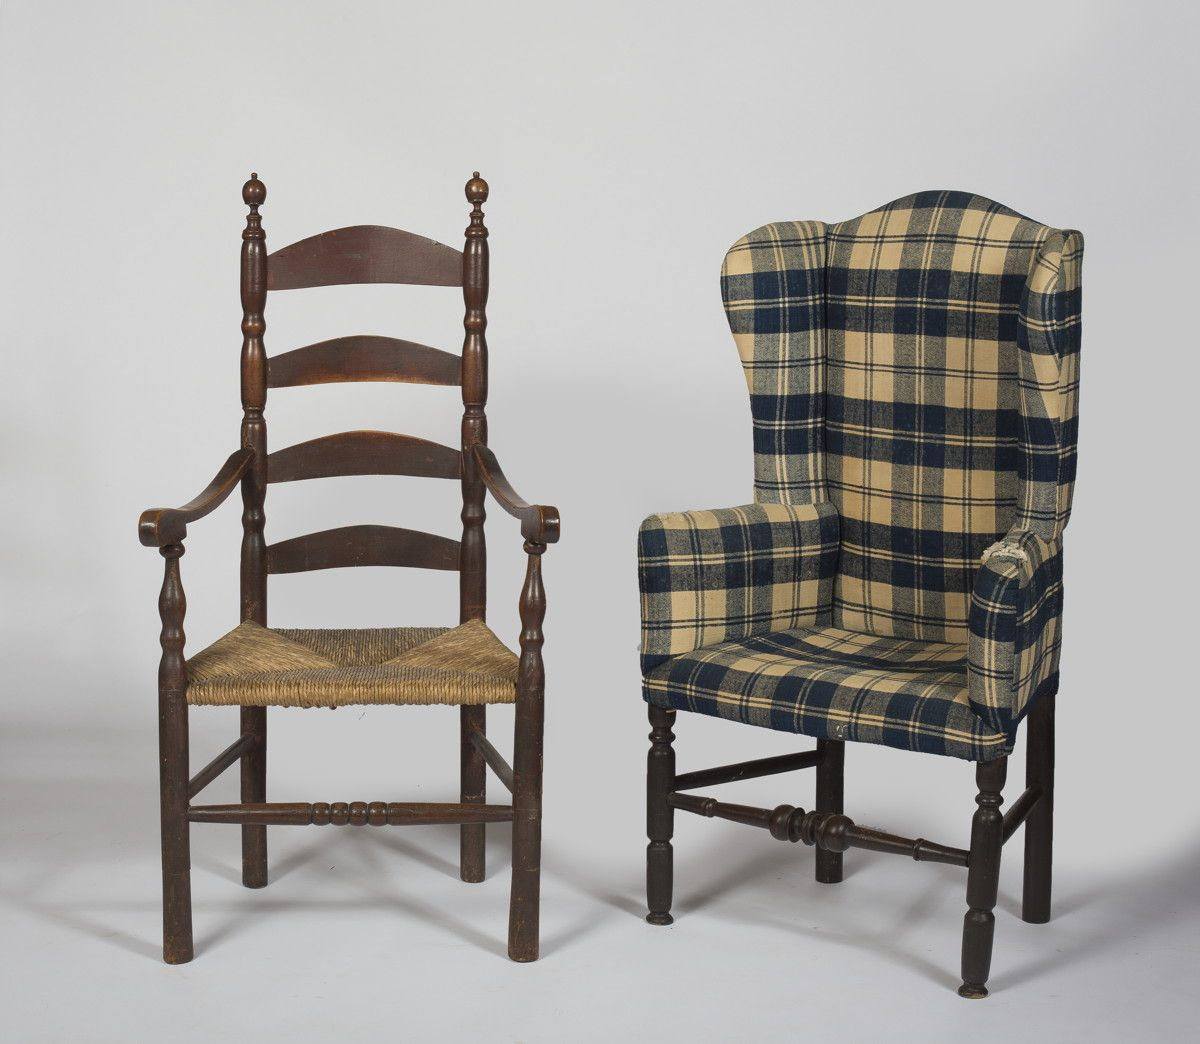 colonial wingback sofas tiendas de baratas en madrid 18th c make do easy chair made from a ladderback armchair